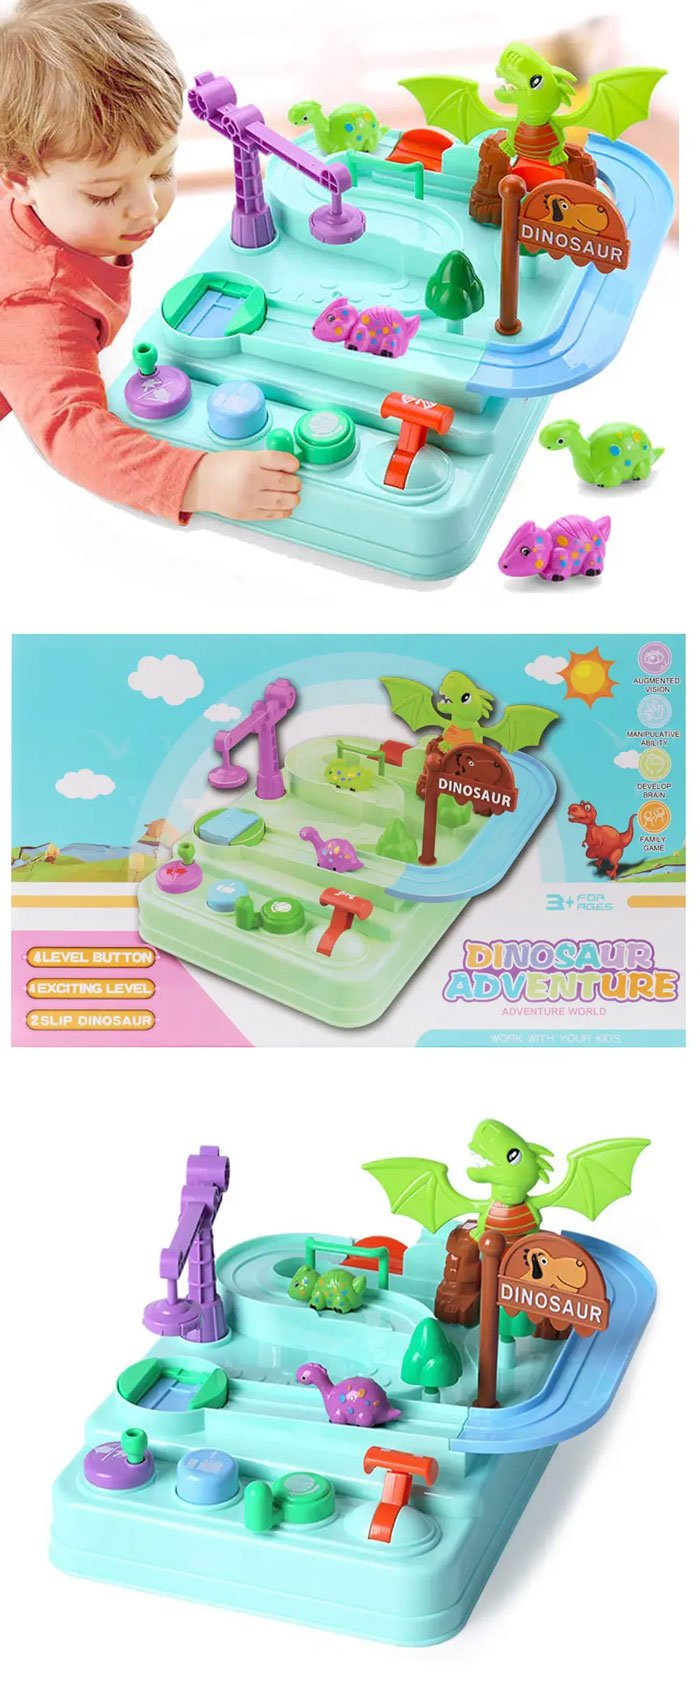 Dinosaur Adventure Play Set 5577-18